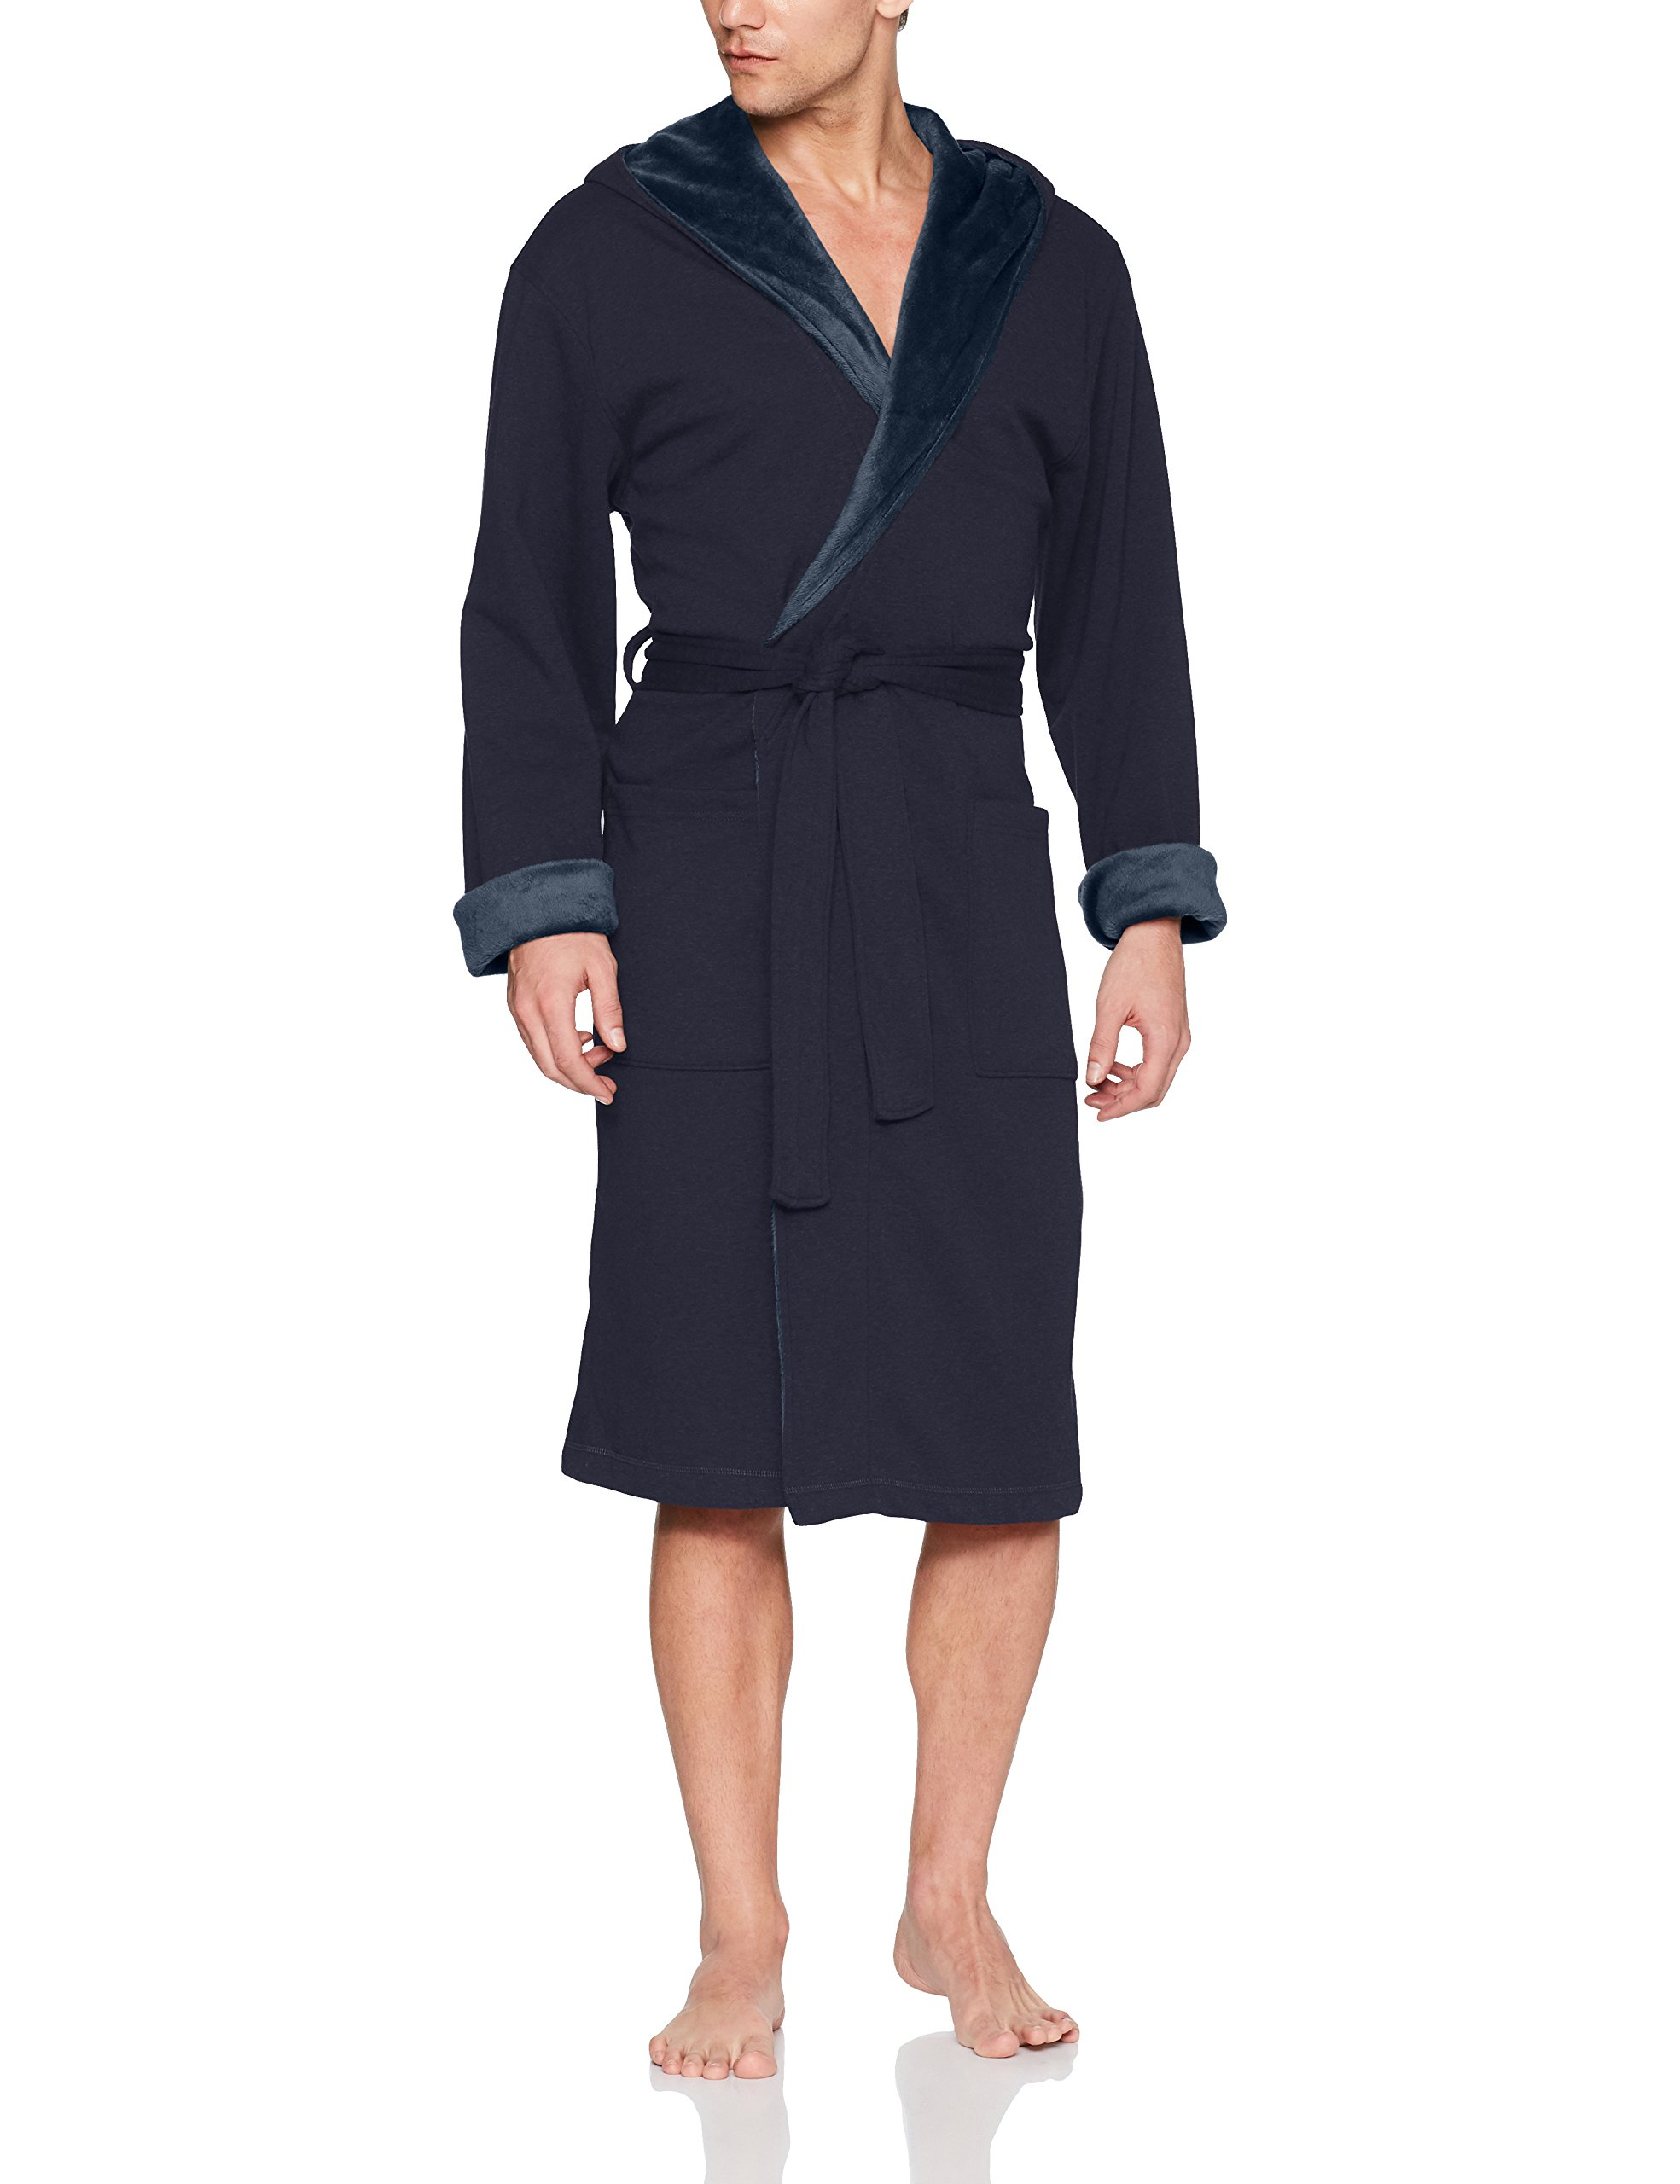 UGG Men's Brunswick Sleepwear, -navy, M/L